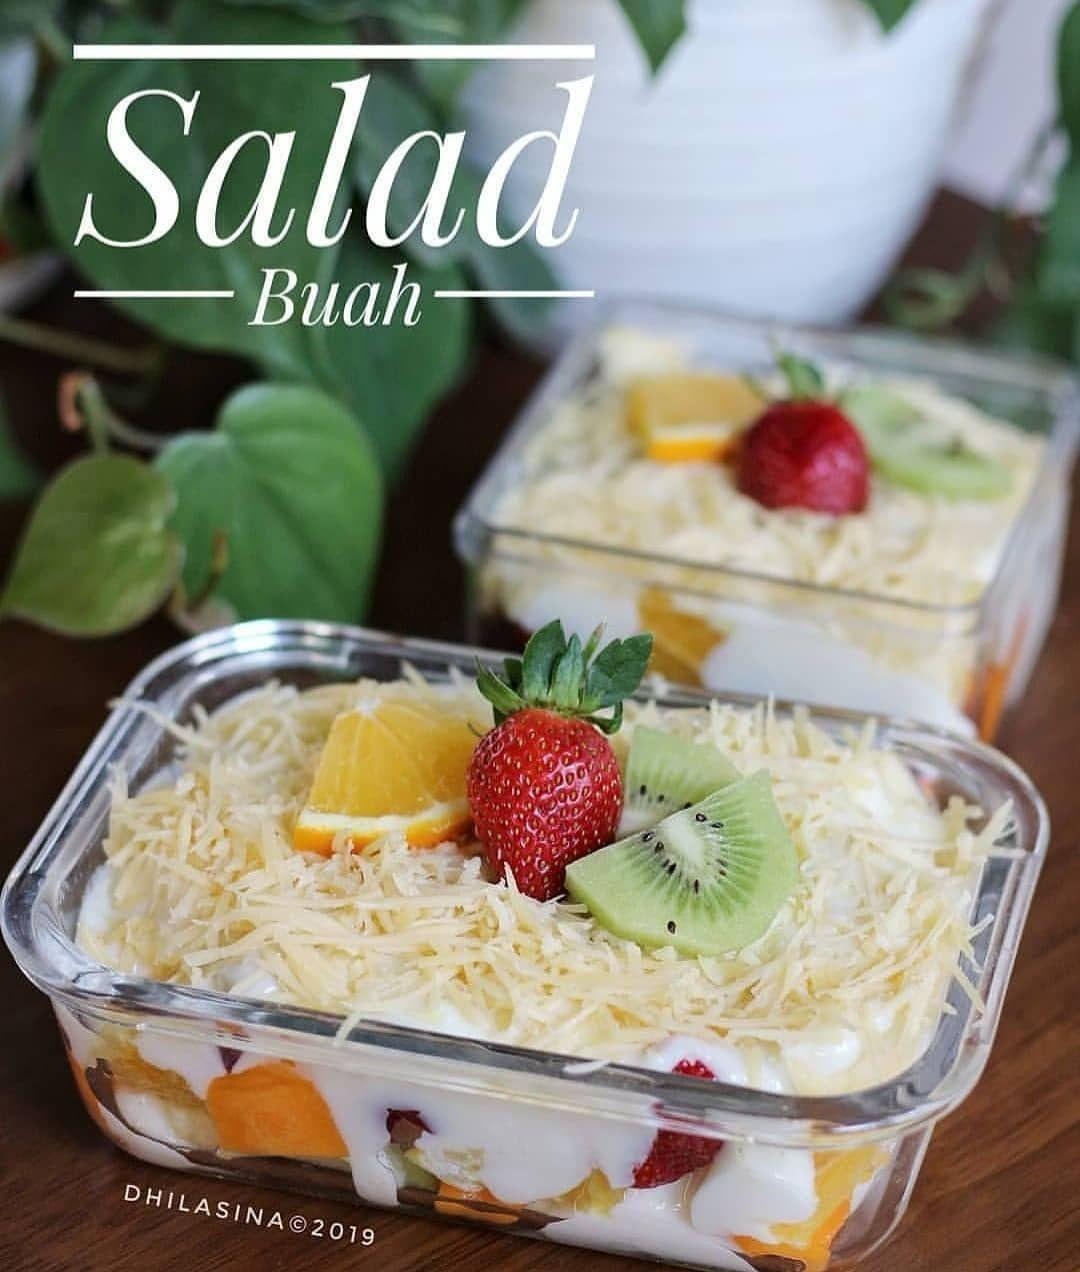 Inspirasi Resep Mudah On Jangan Lupa Tap Love Yah Salad Buah Ala Dhilasina Untuk 1wadah Ukuran 10x15 1wadah Ukuran 10x10 Easy Smoothie Recipes Food Save Food